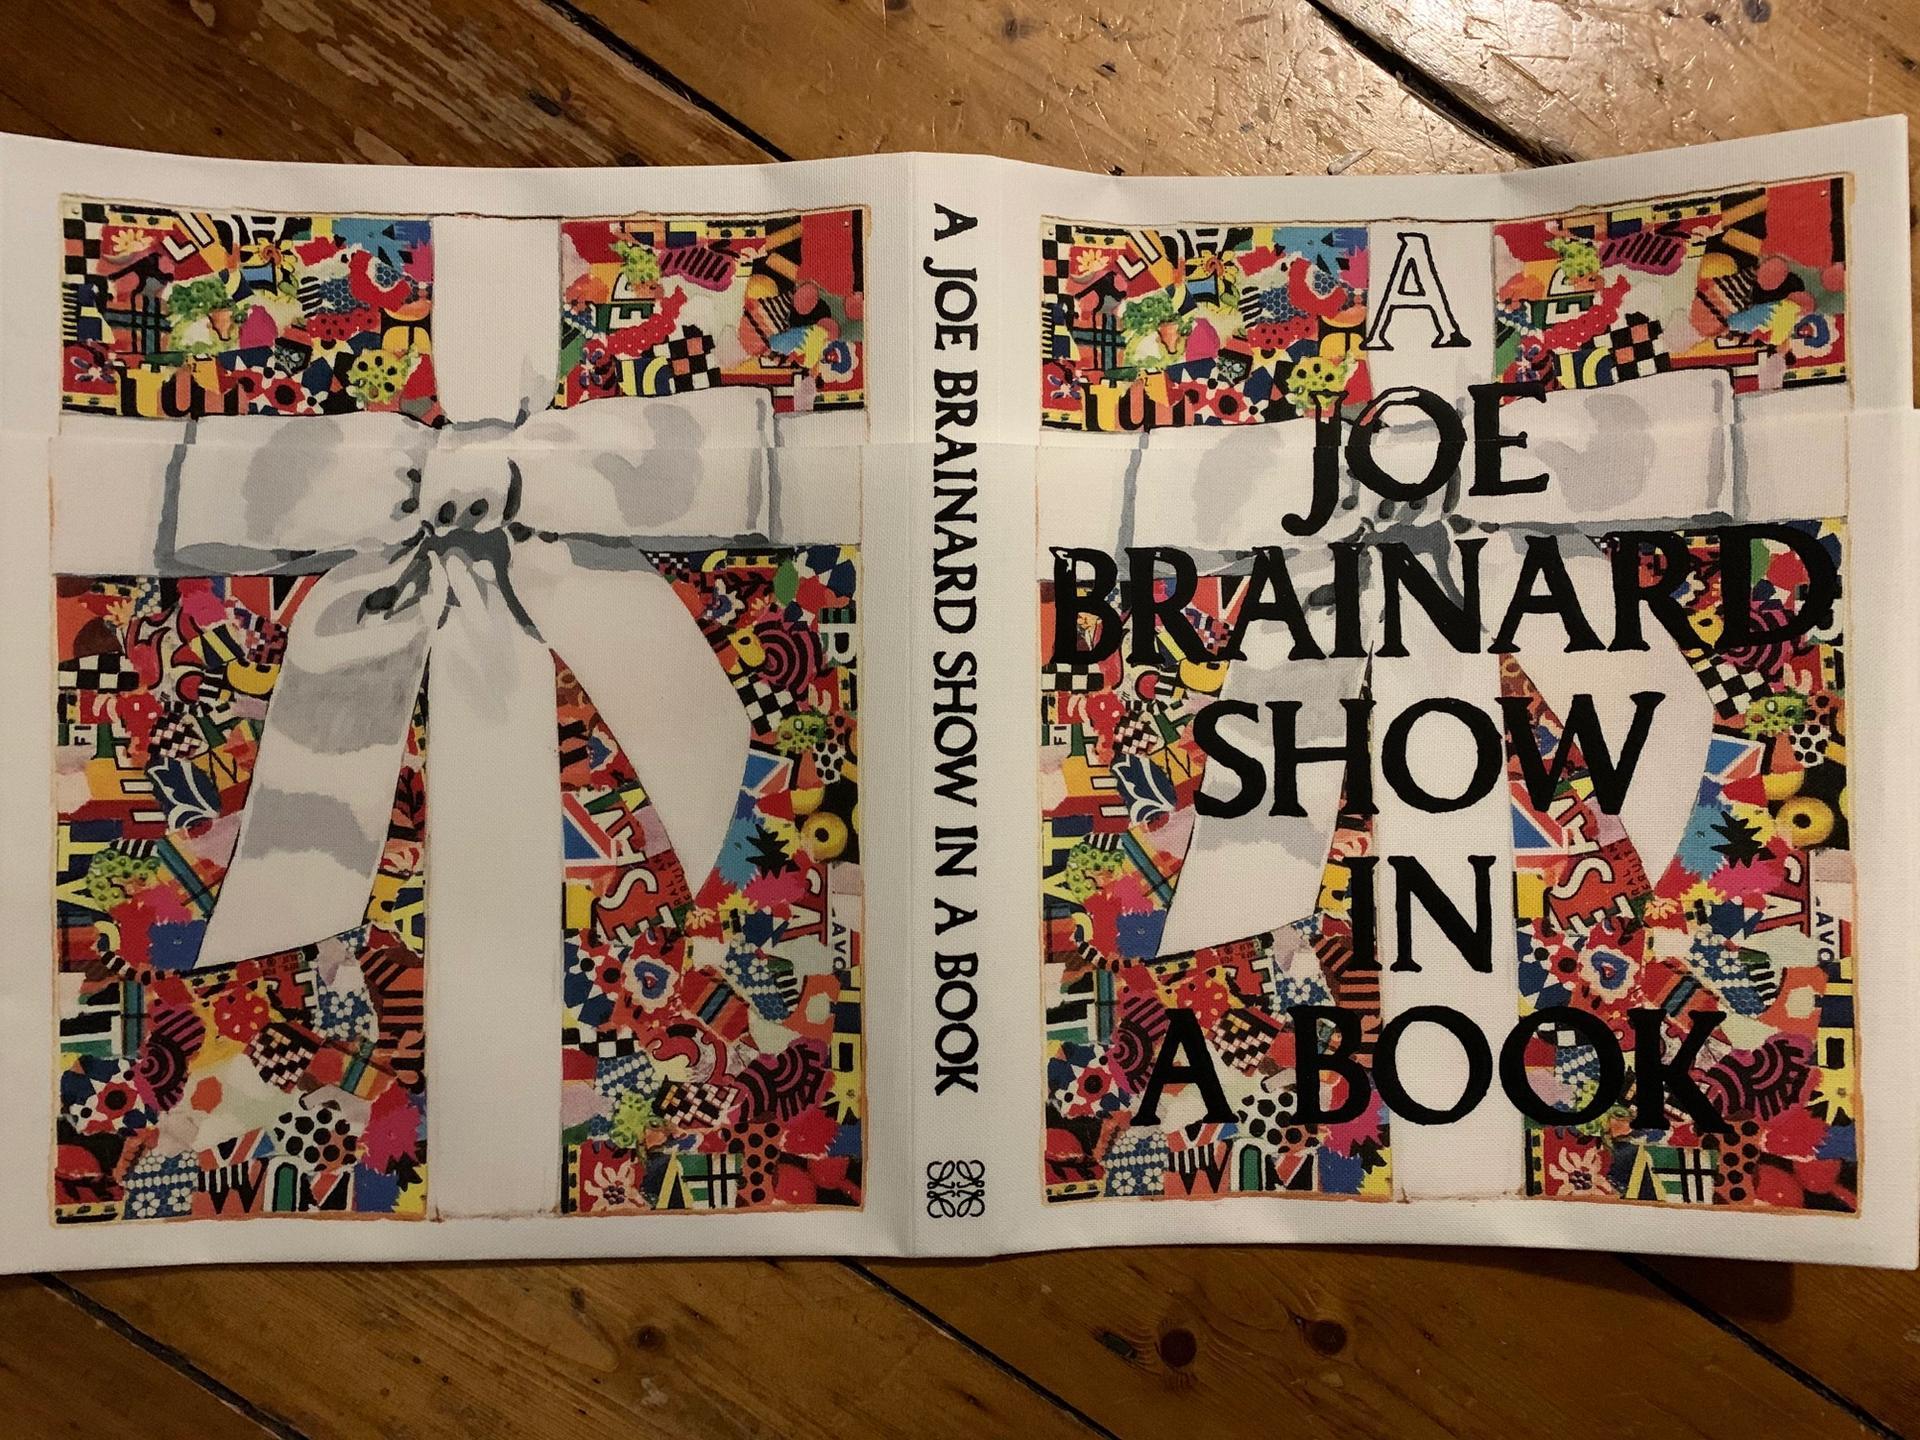 A Joe Brainard Show in a Book from Loewe Gareth Harris